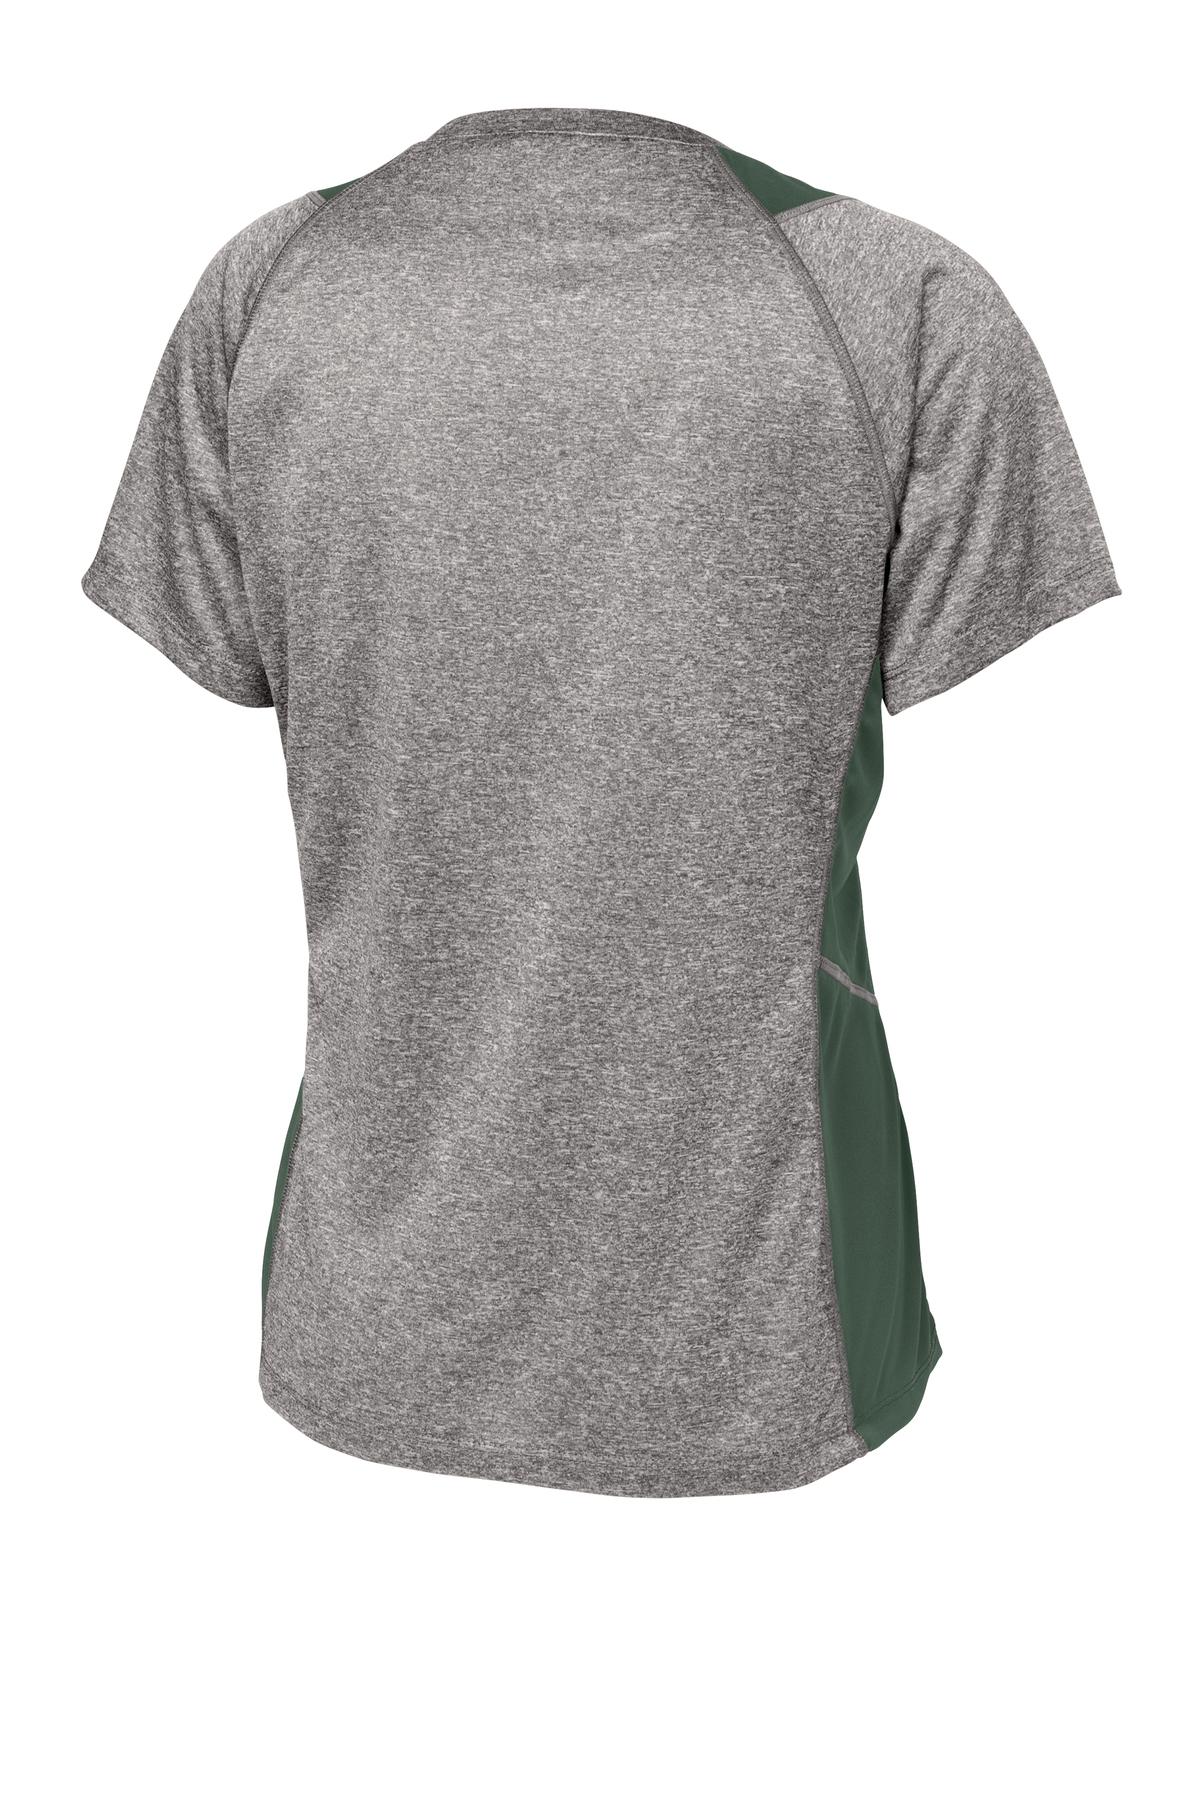 Sport Tek Youth Heather Colorblock Contender T-Shirt-S Vintage Heather//Black